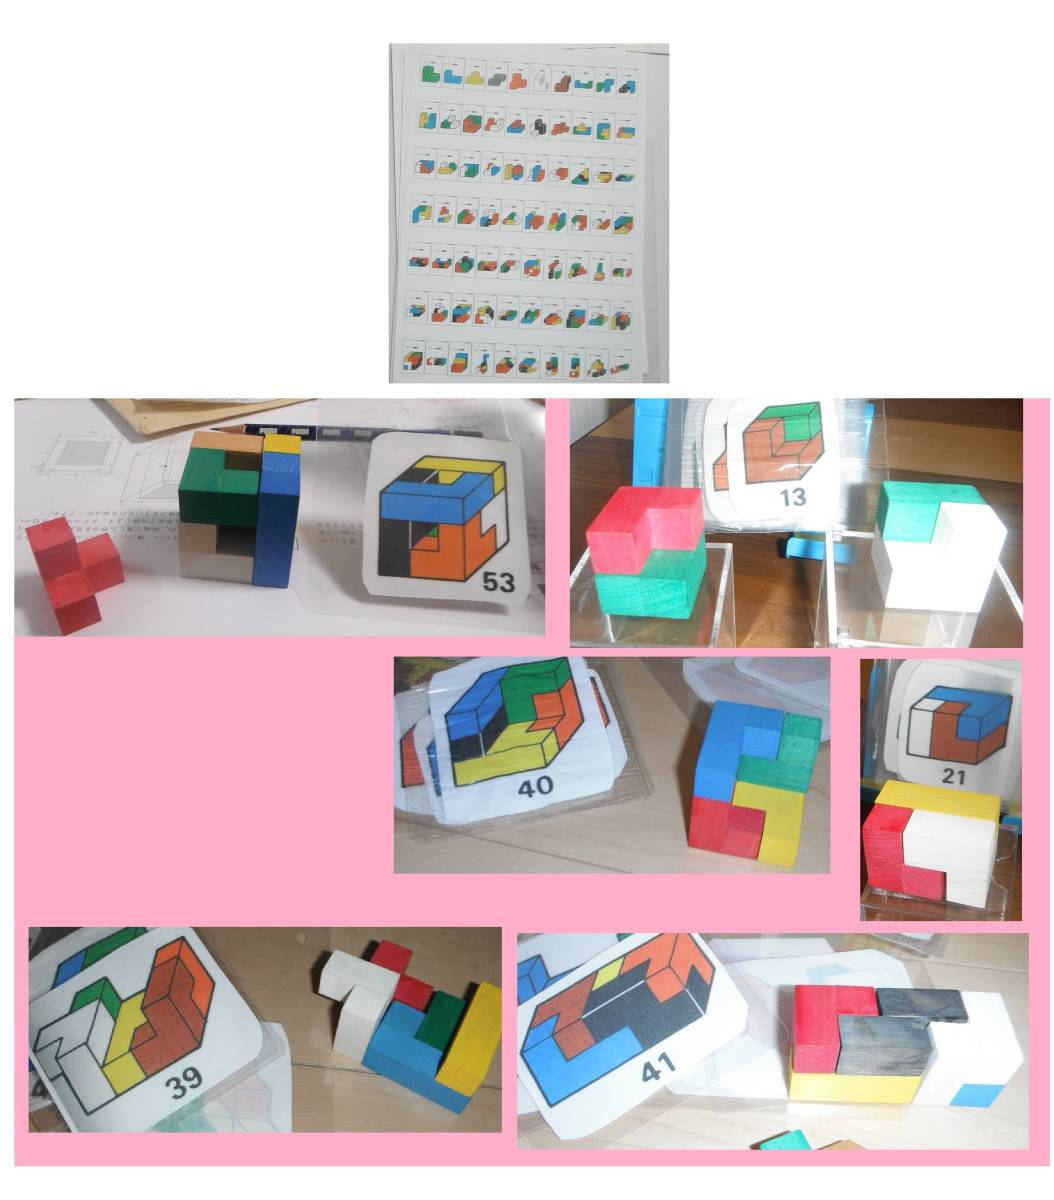 (5d)ニキーチン みんなの積み木 解答編 手本セット パターンカード つみき 家庭保育園 モンテッソーリ 中学受験 立体 公文_画像2